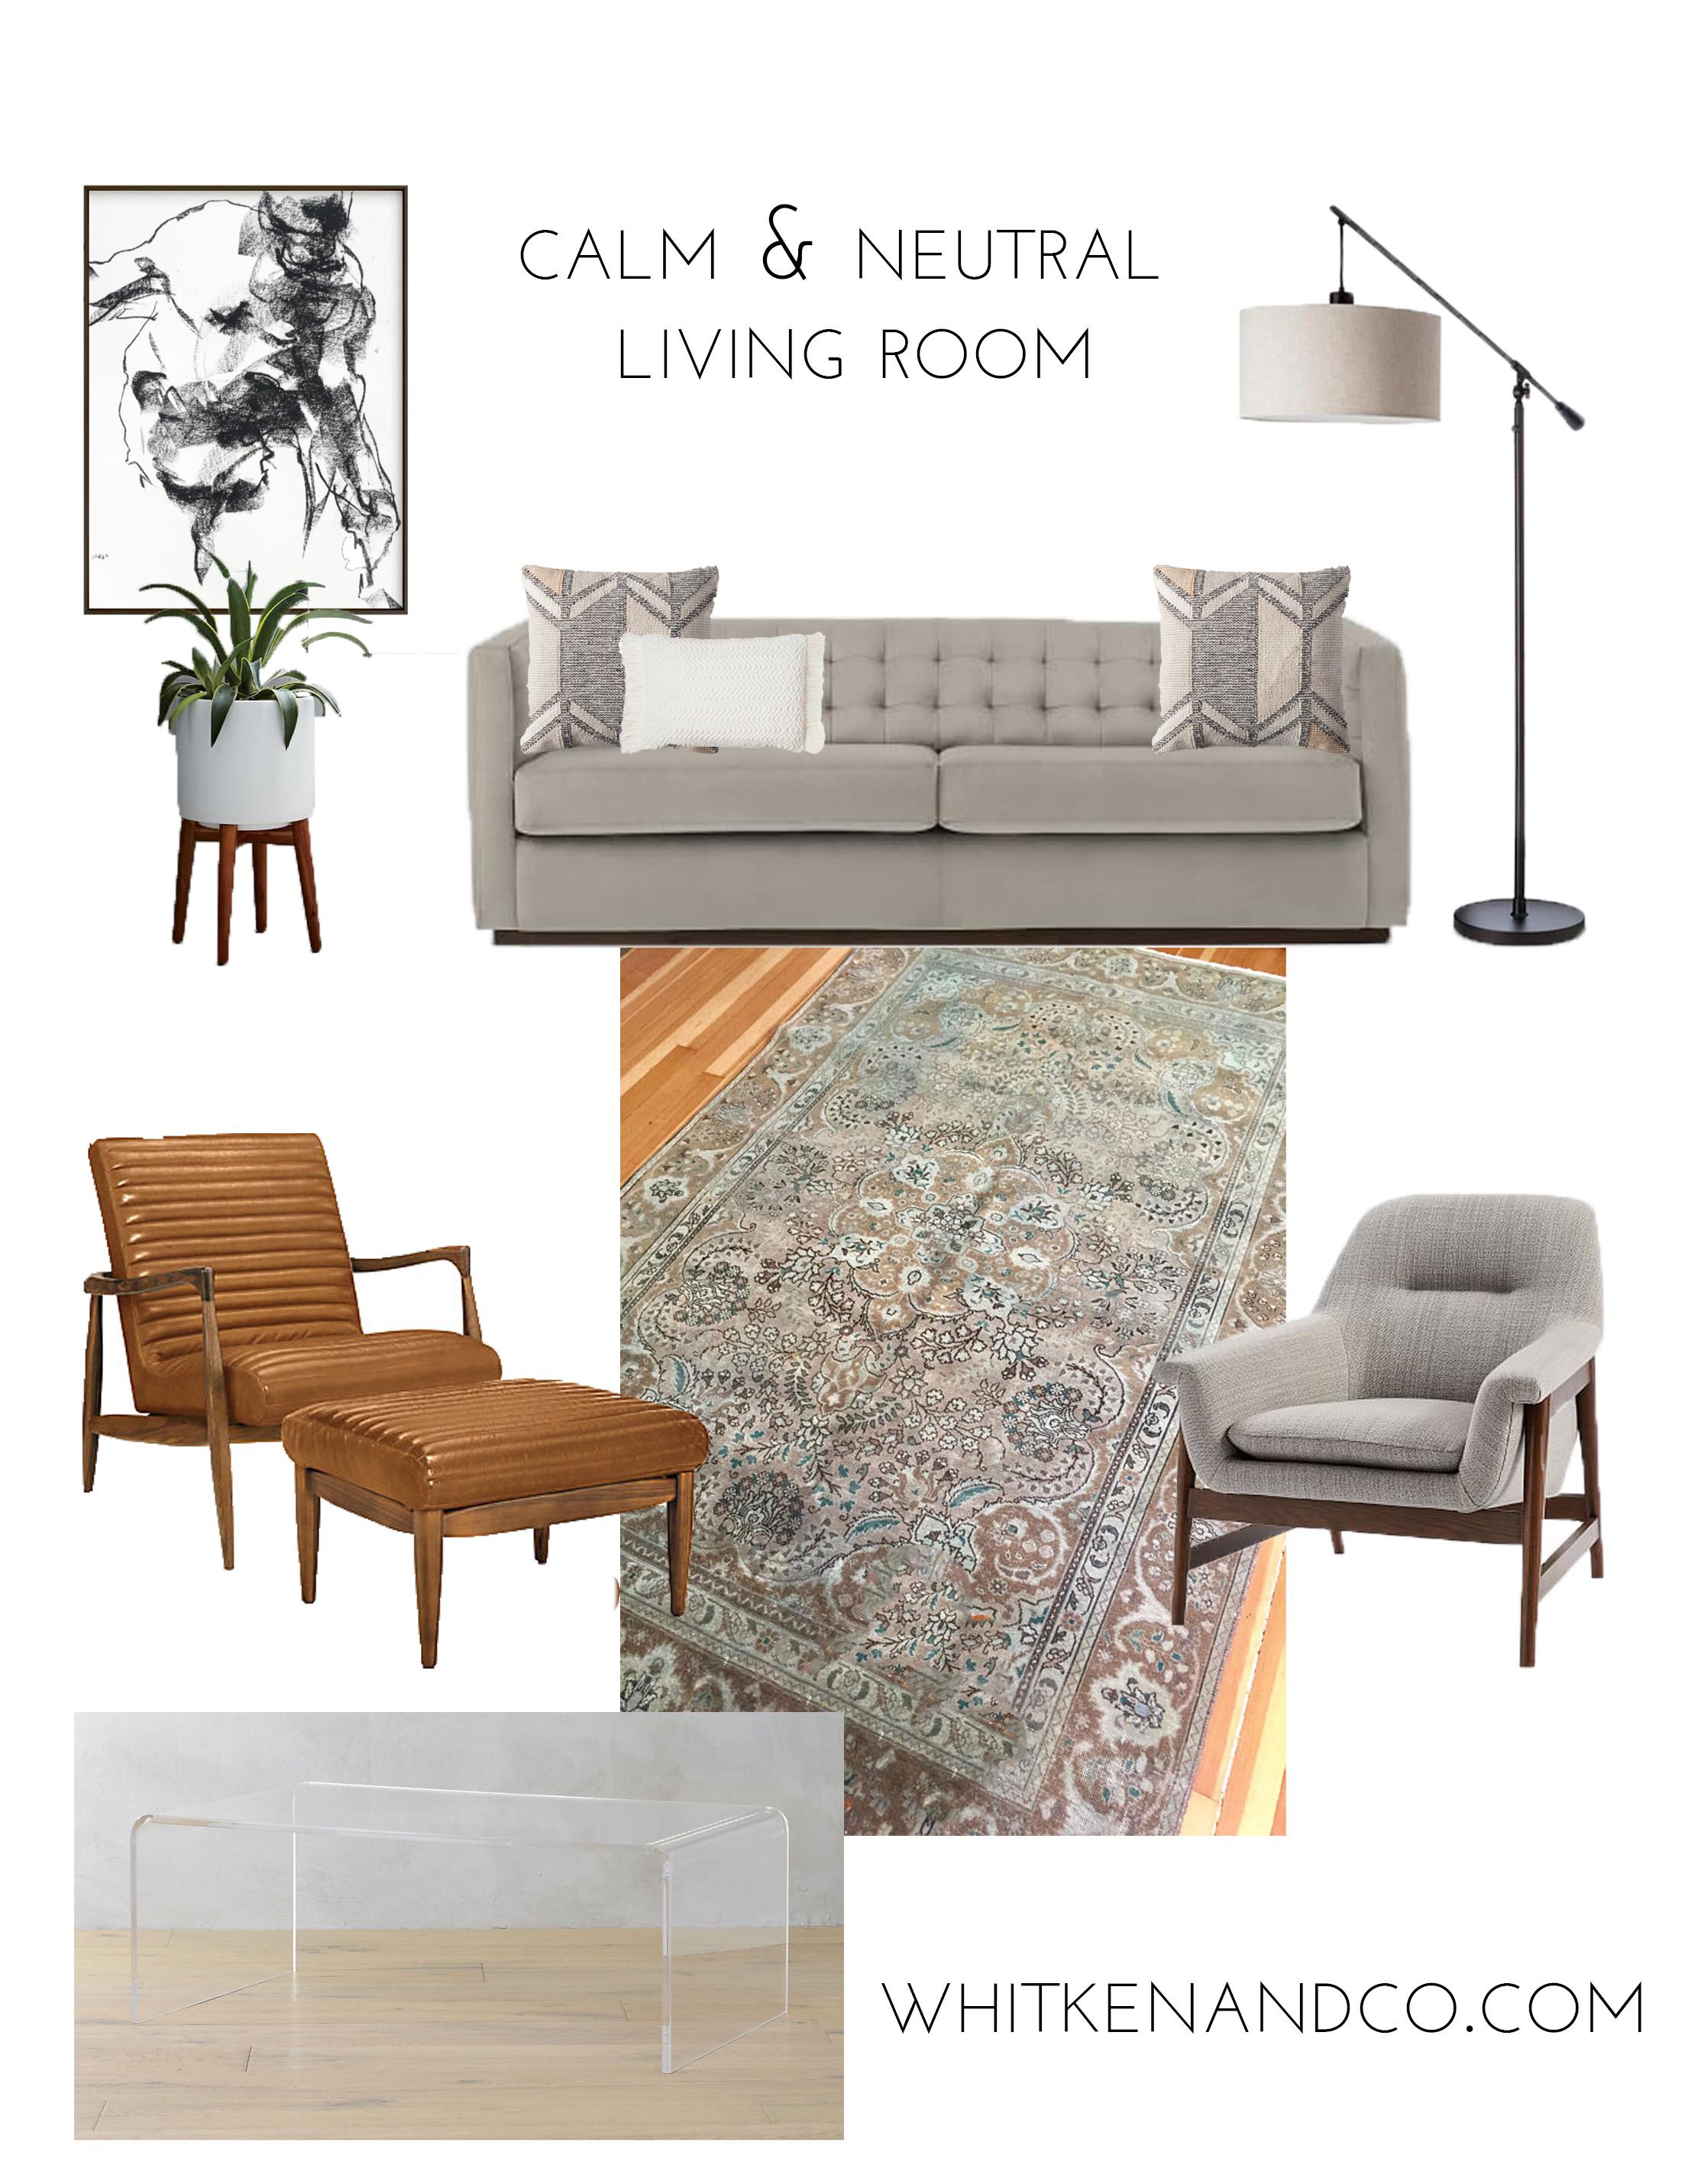 Calm & Neutral Living Room